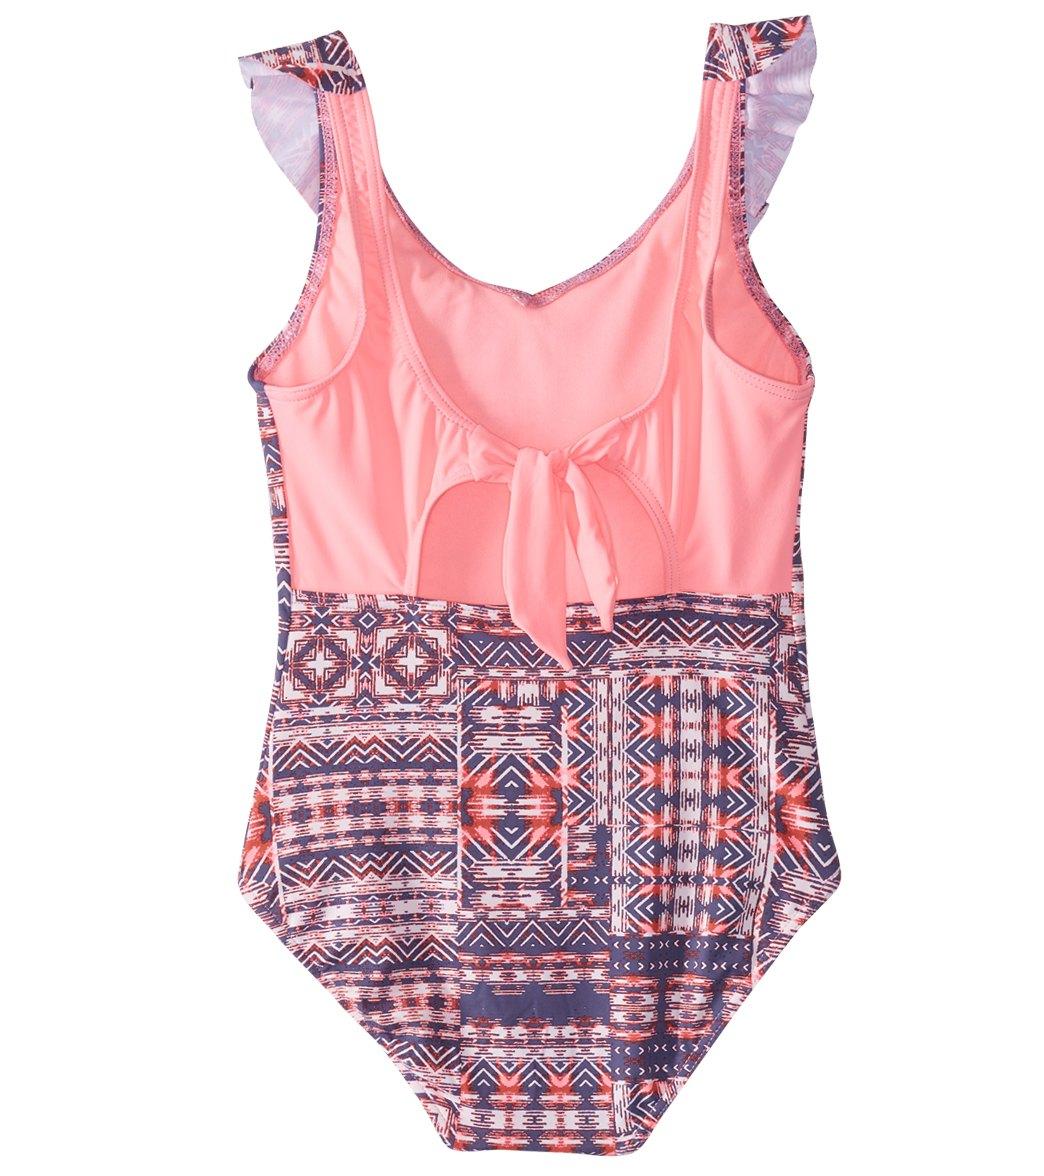 05407c64d3492 Roxy Girls  Wavy Beach Printed One Piece Swimsuit (Big Kid) at ...